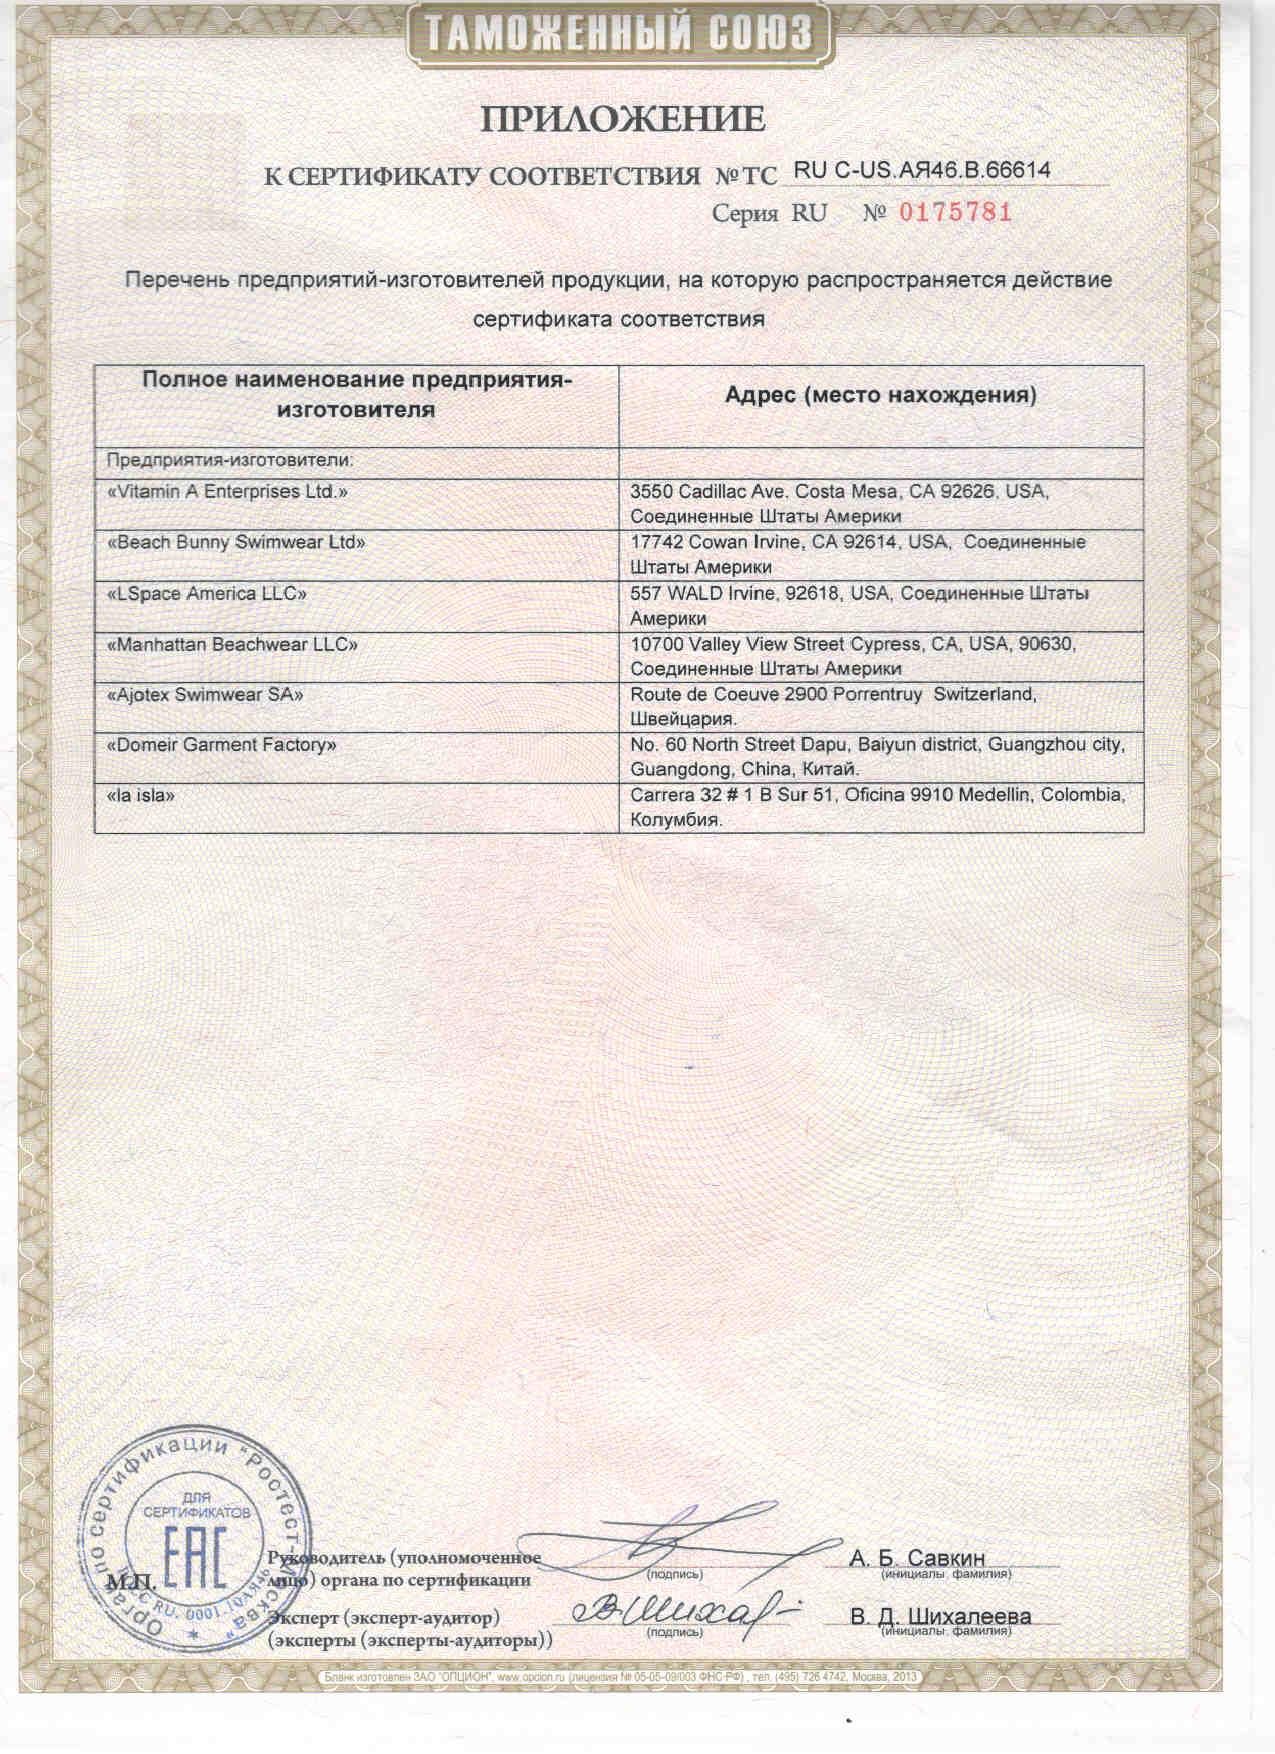 Приложение к сертификату Earth and Sea Wear LLC